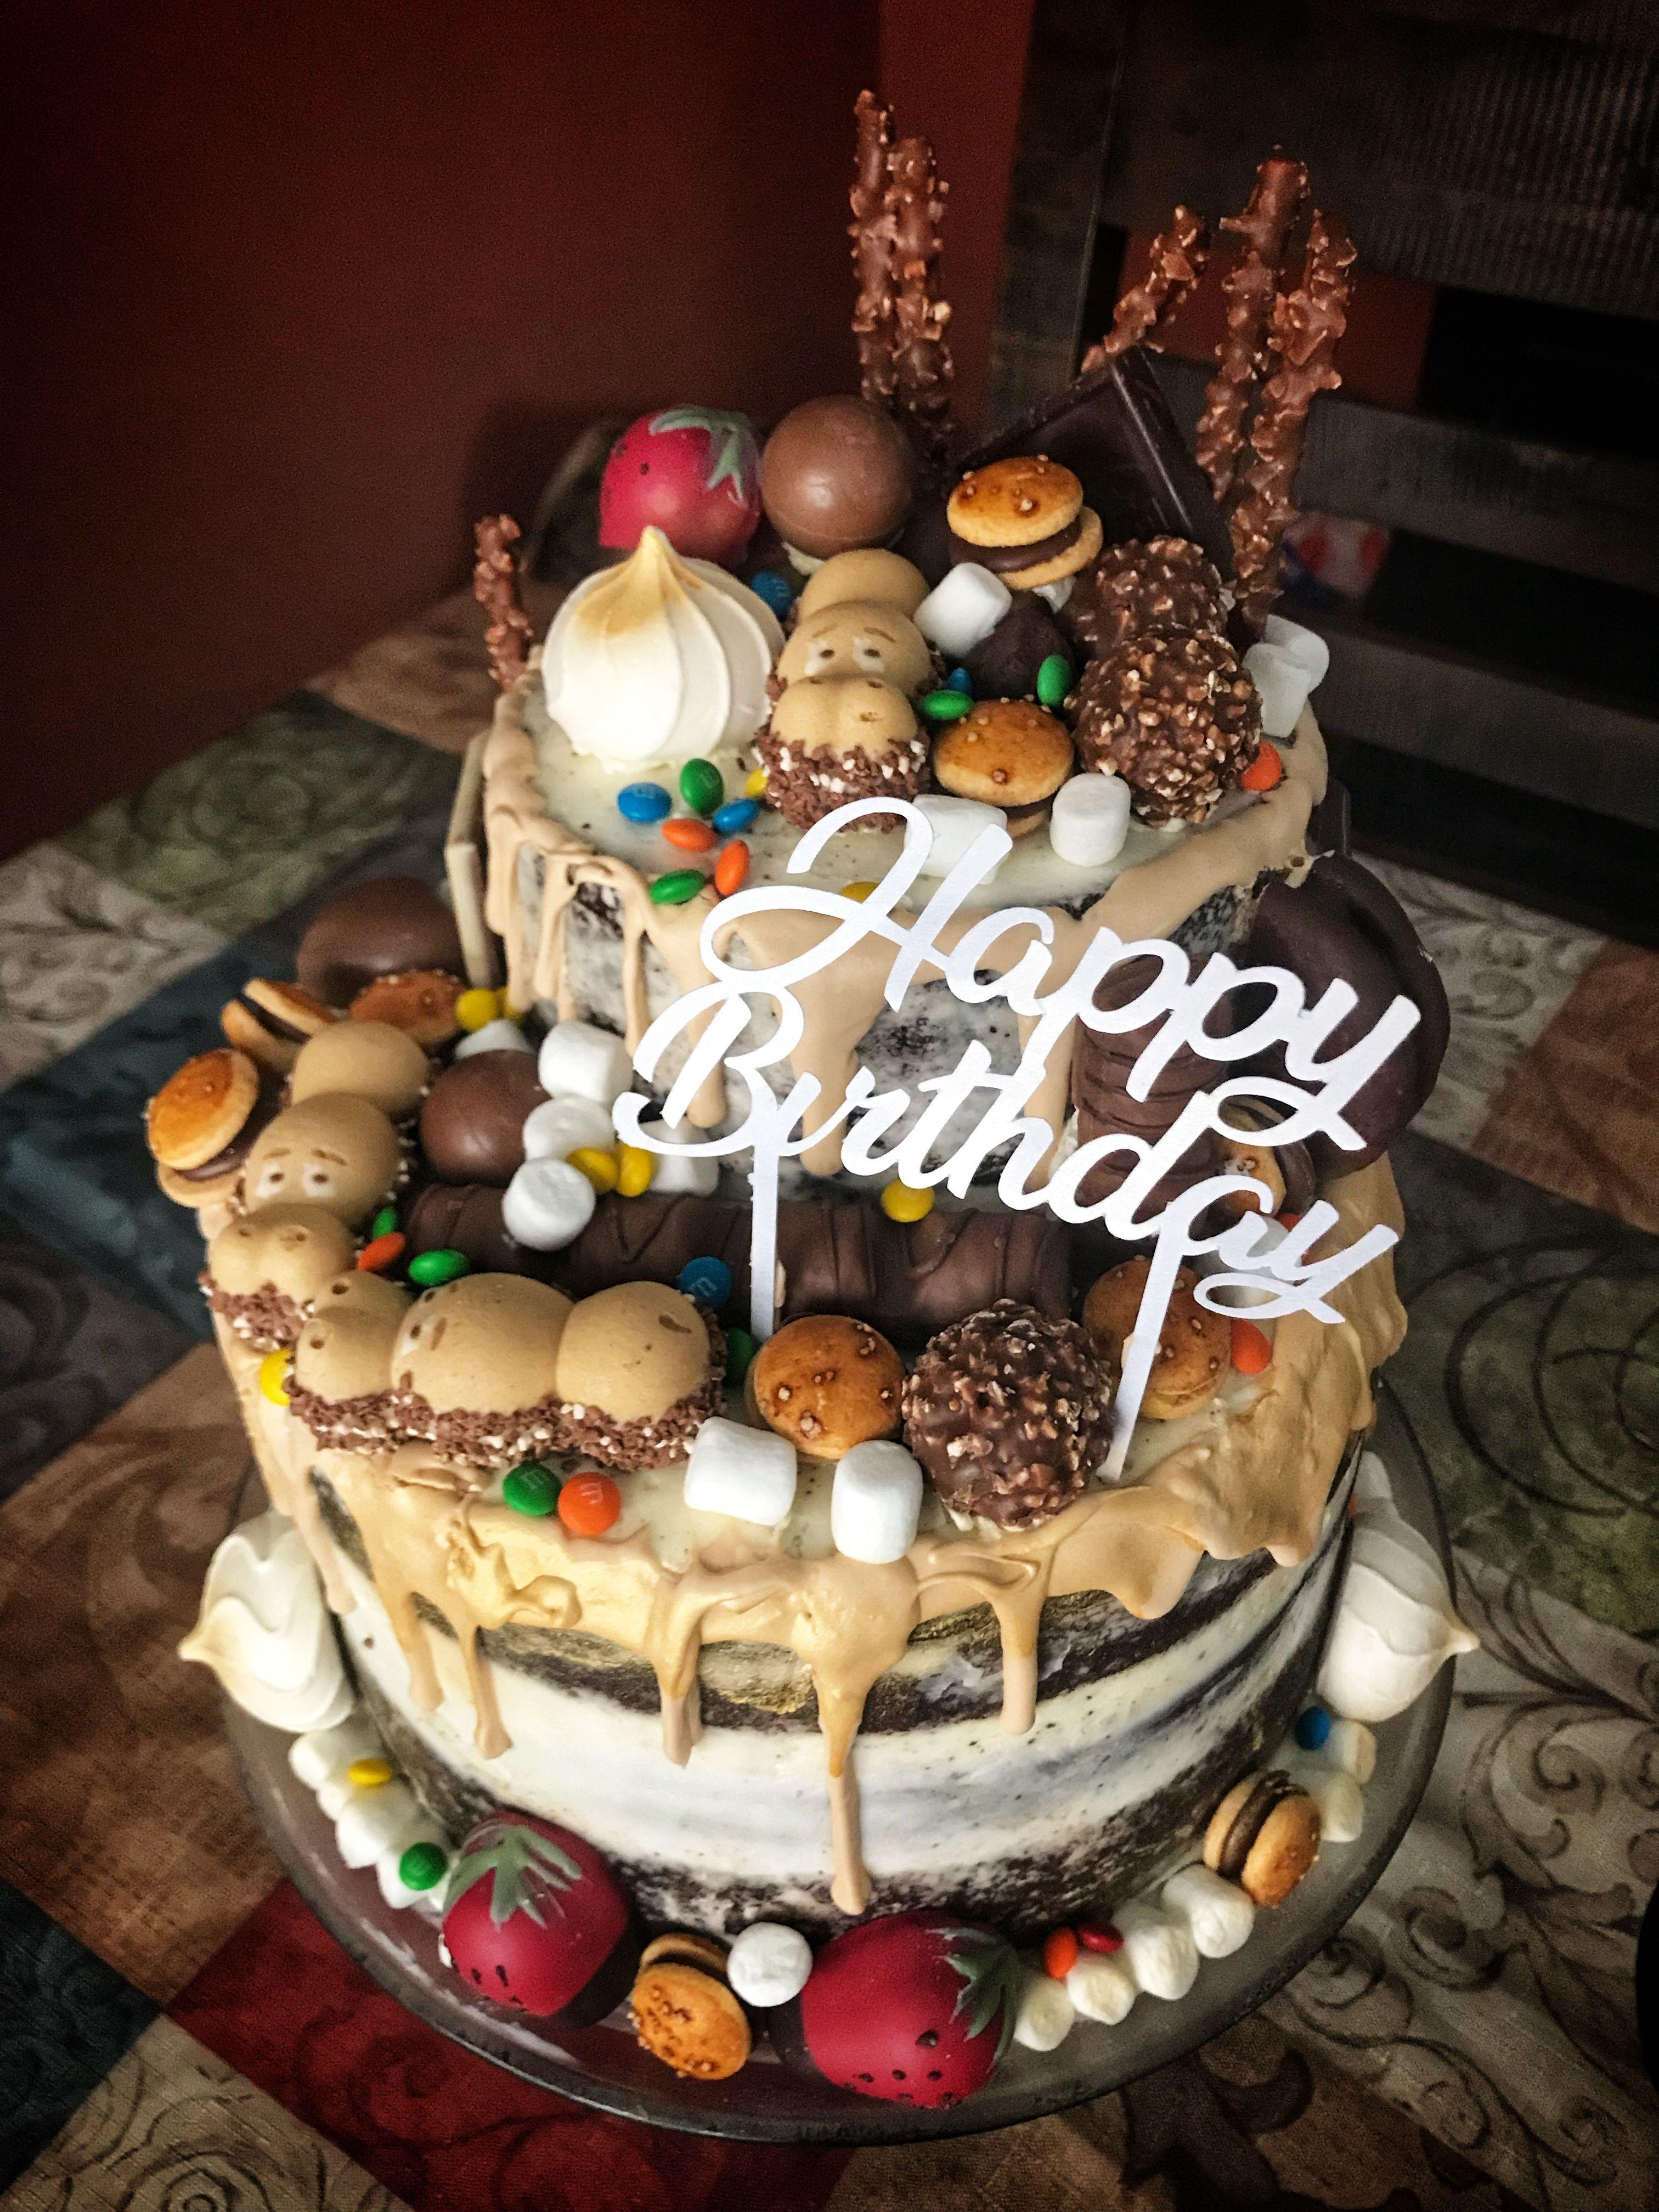 Chocolate Overload On A Chocolate Cake